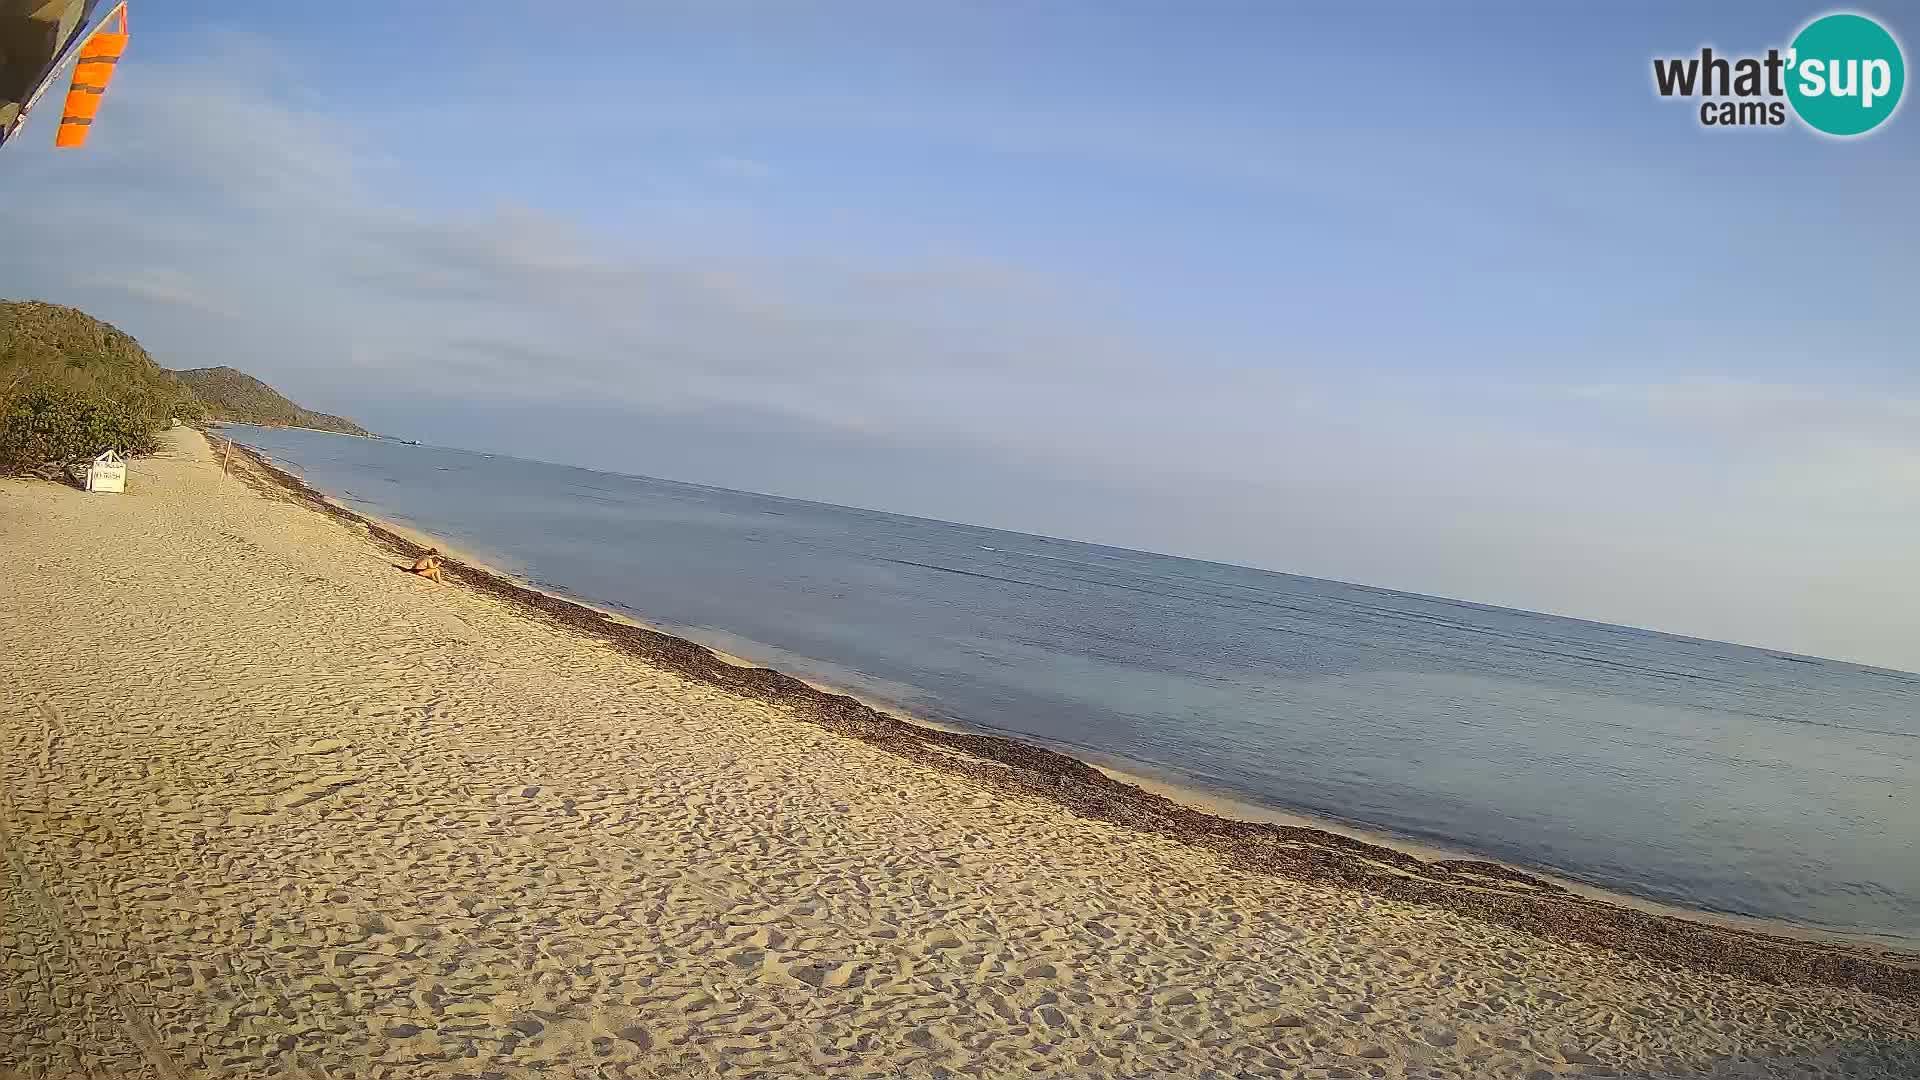 Web kamera plaza Buen Hombre – Kite School